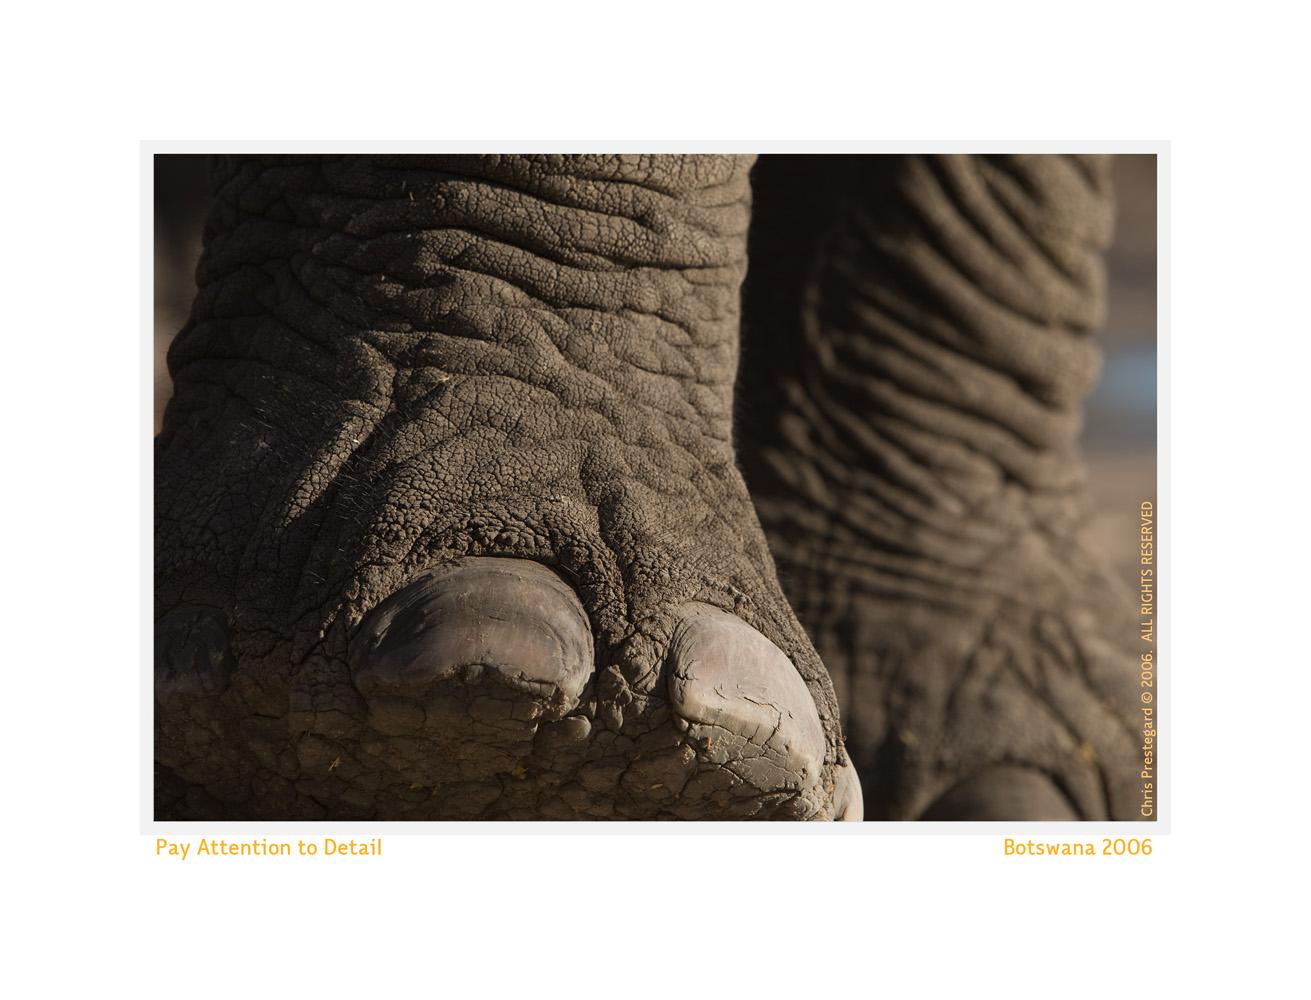 Elephant2535-Oct5-2013